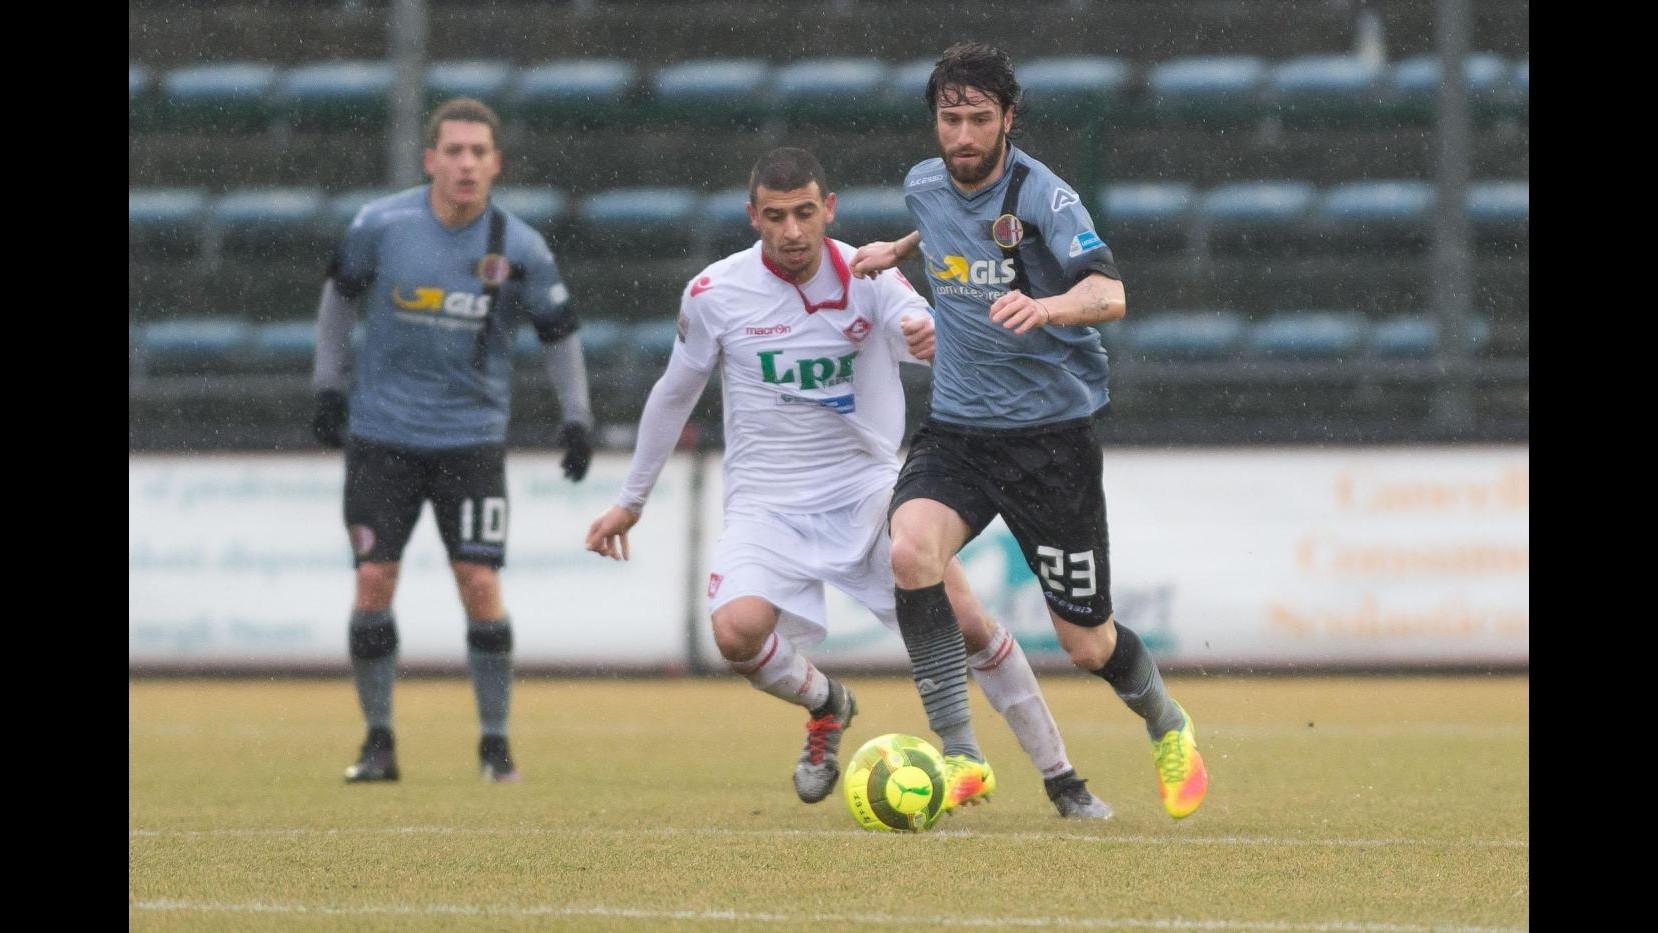 FOTO Lega Pro, Alessandria-Piacenza 1-0: grigi soli in testa